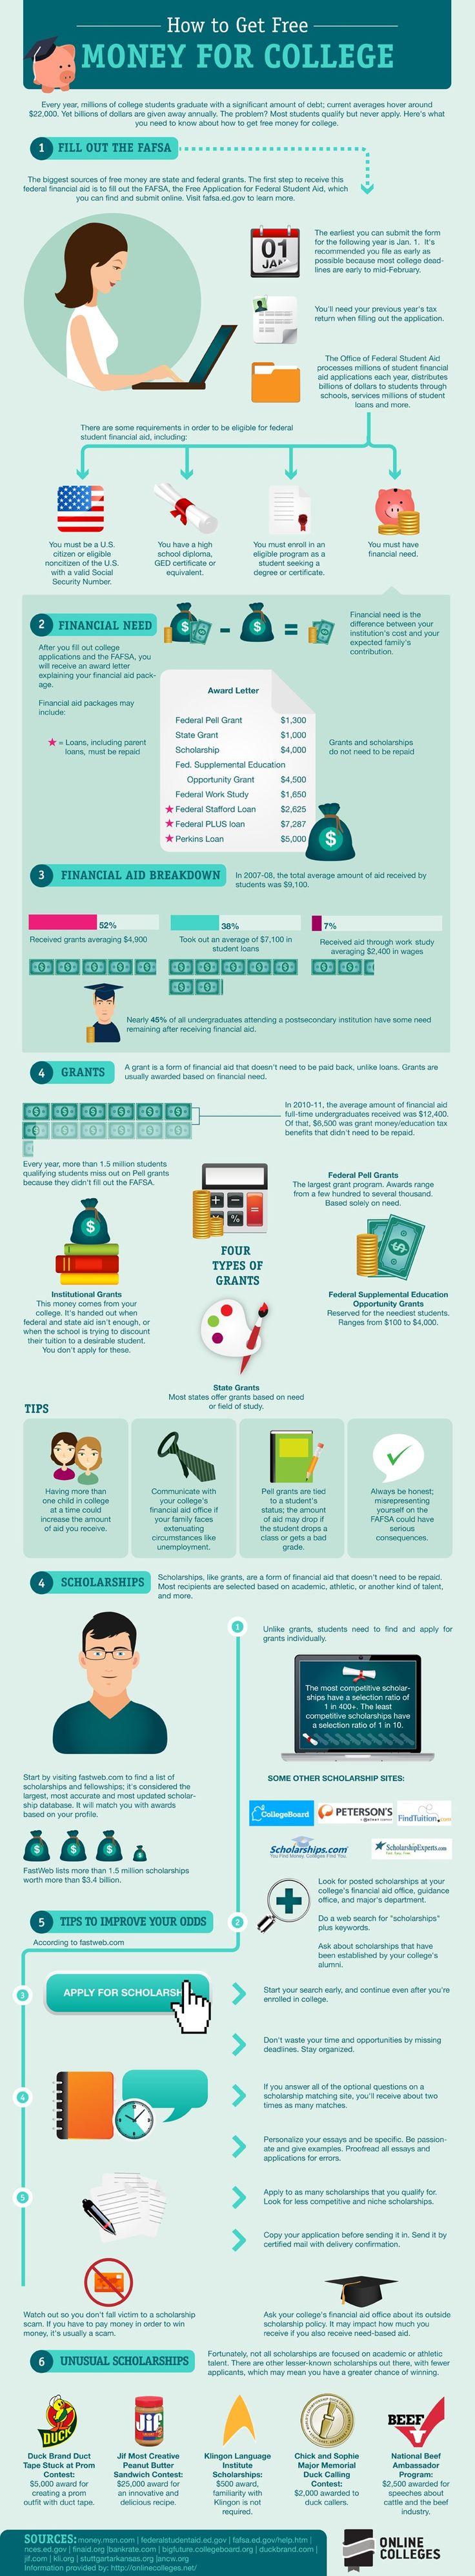 Easy money loans fast image 4